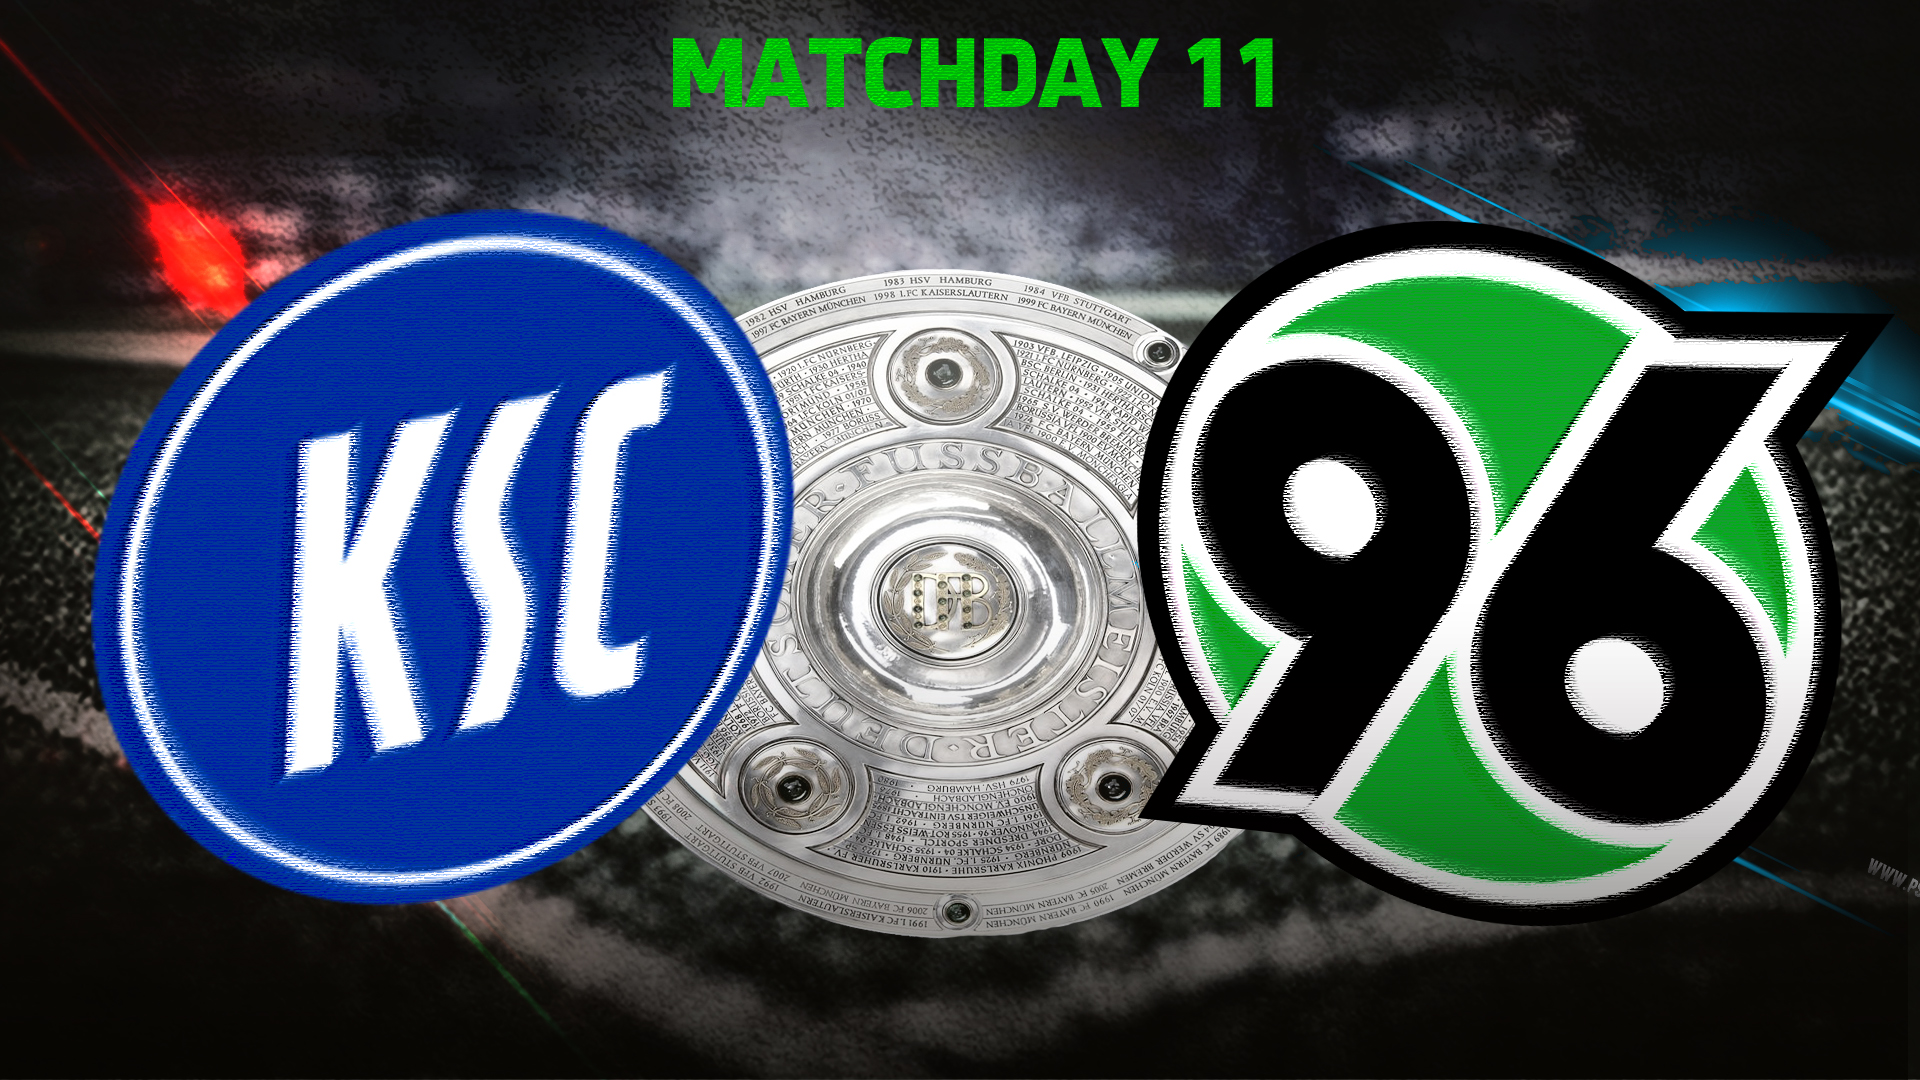 KSC – Hannover 96psd